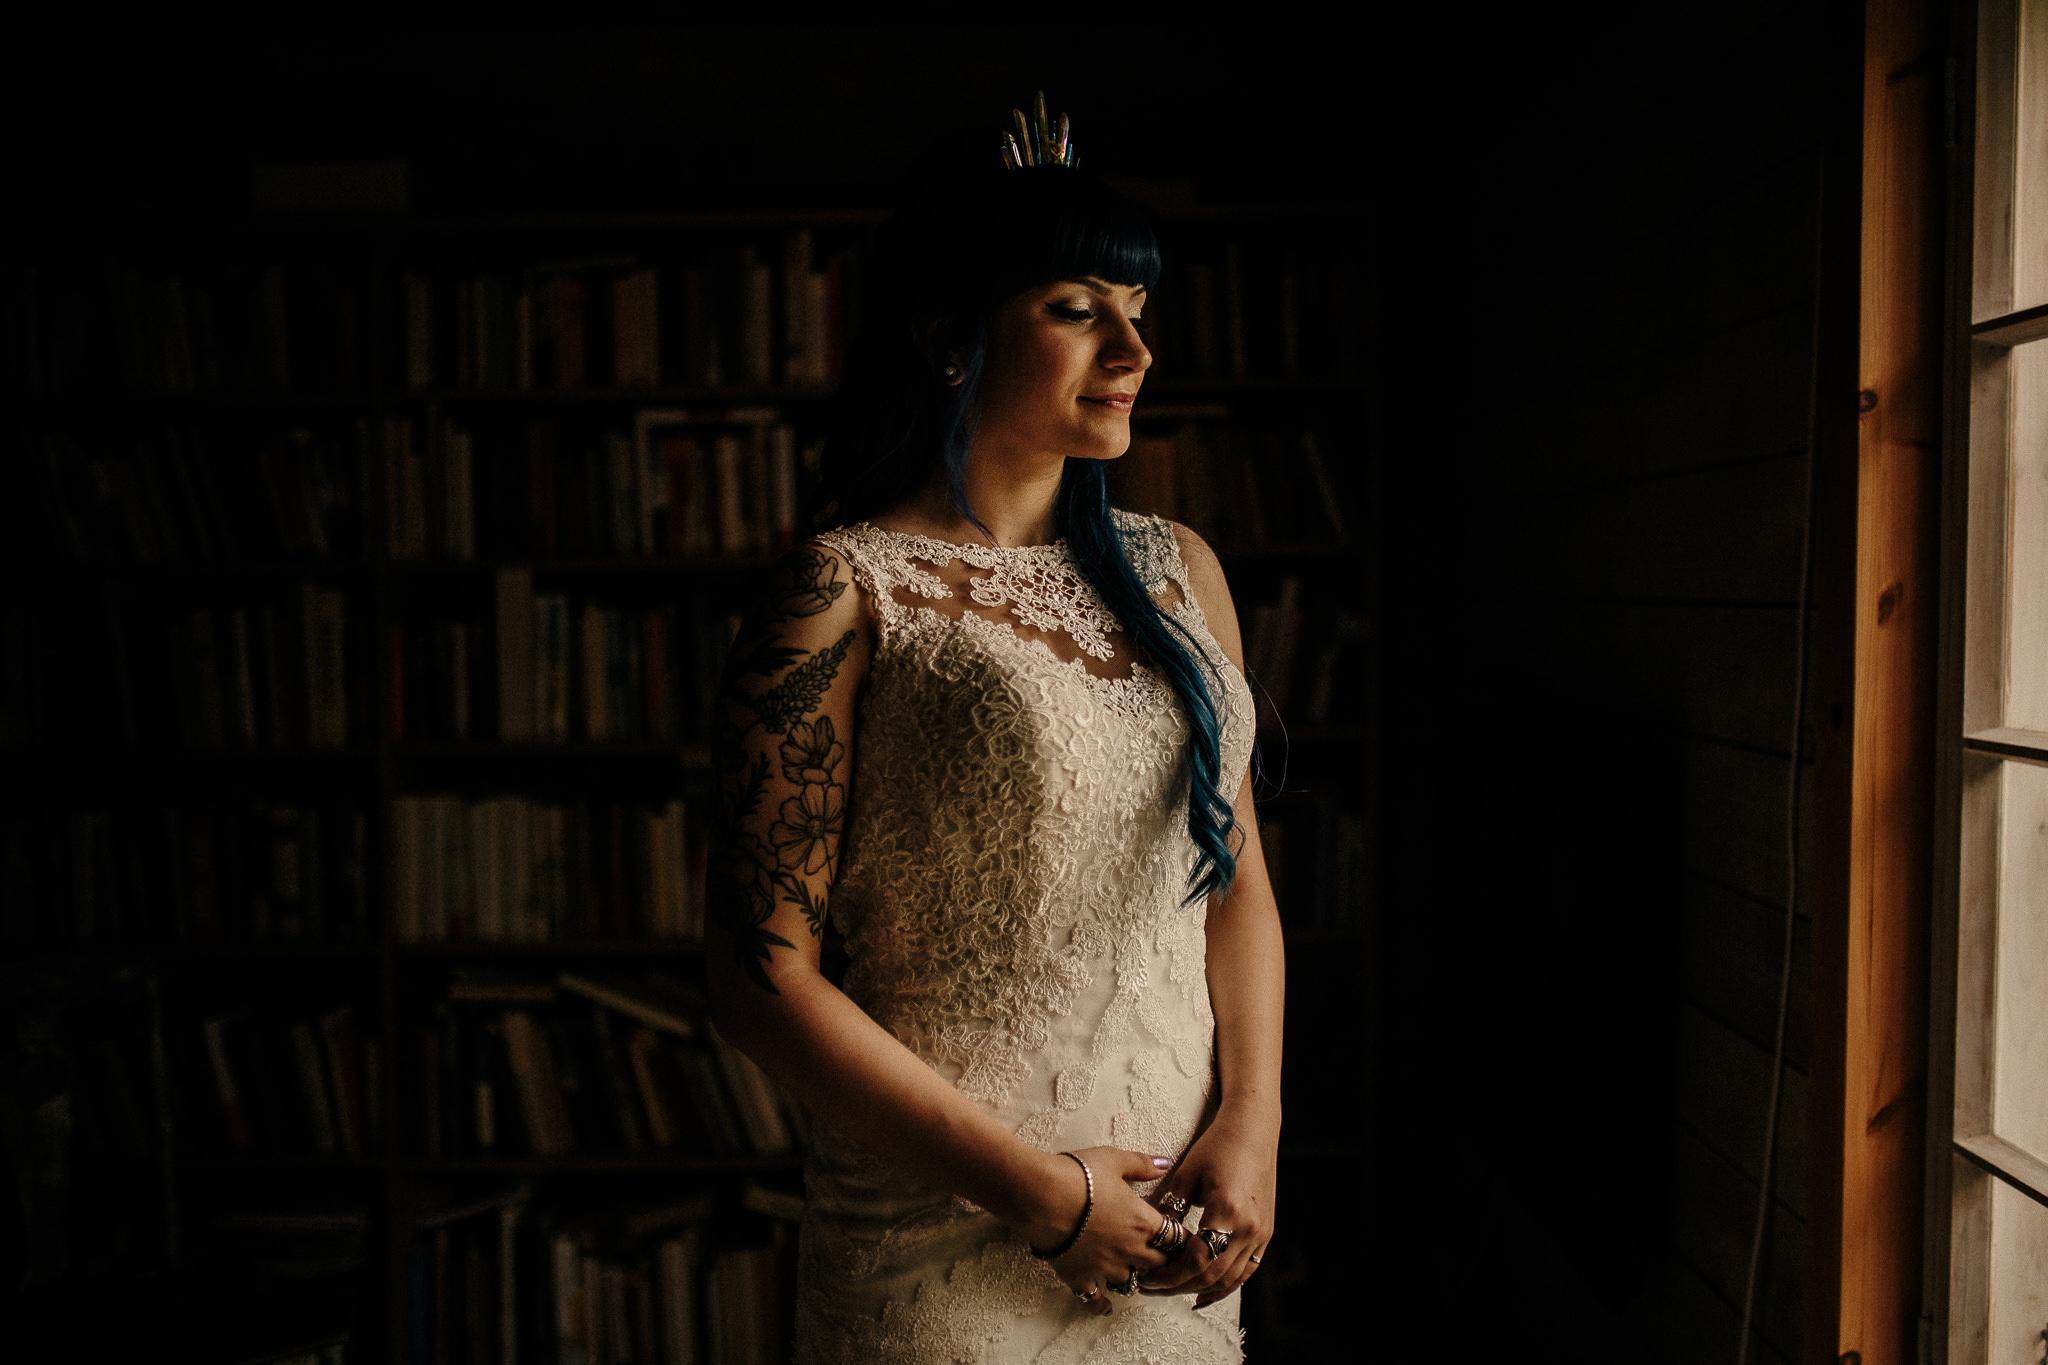 Ceren & Jani - Finland Wedding Photographer - Weddings by Qay - Wedding Photographer (43 of 166).jpg